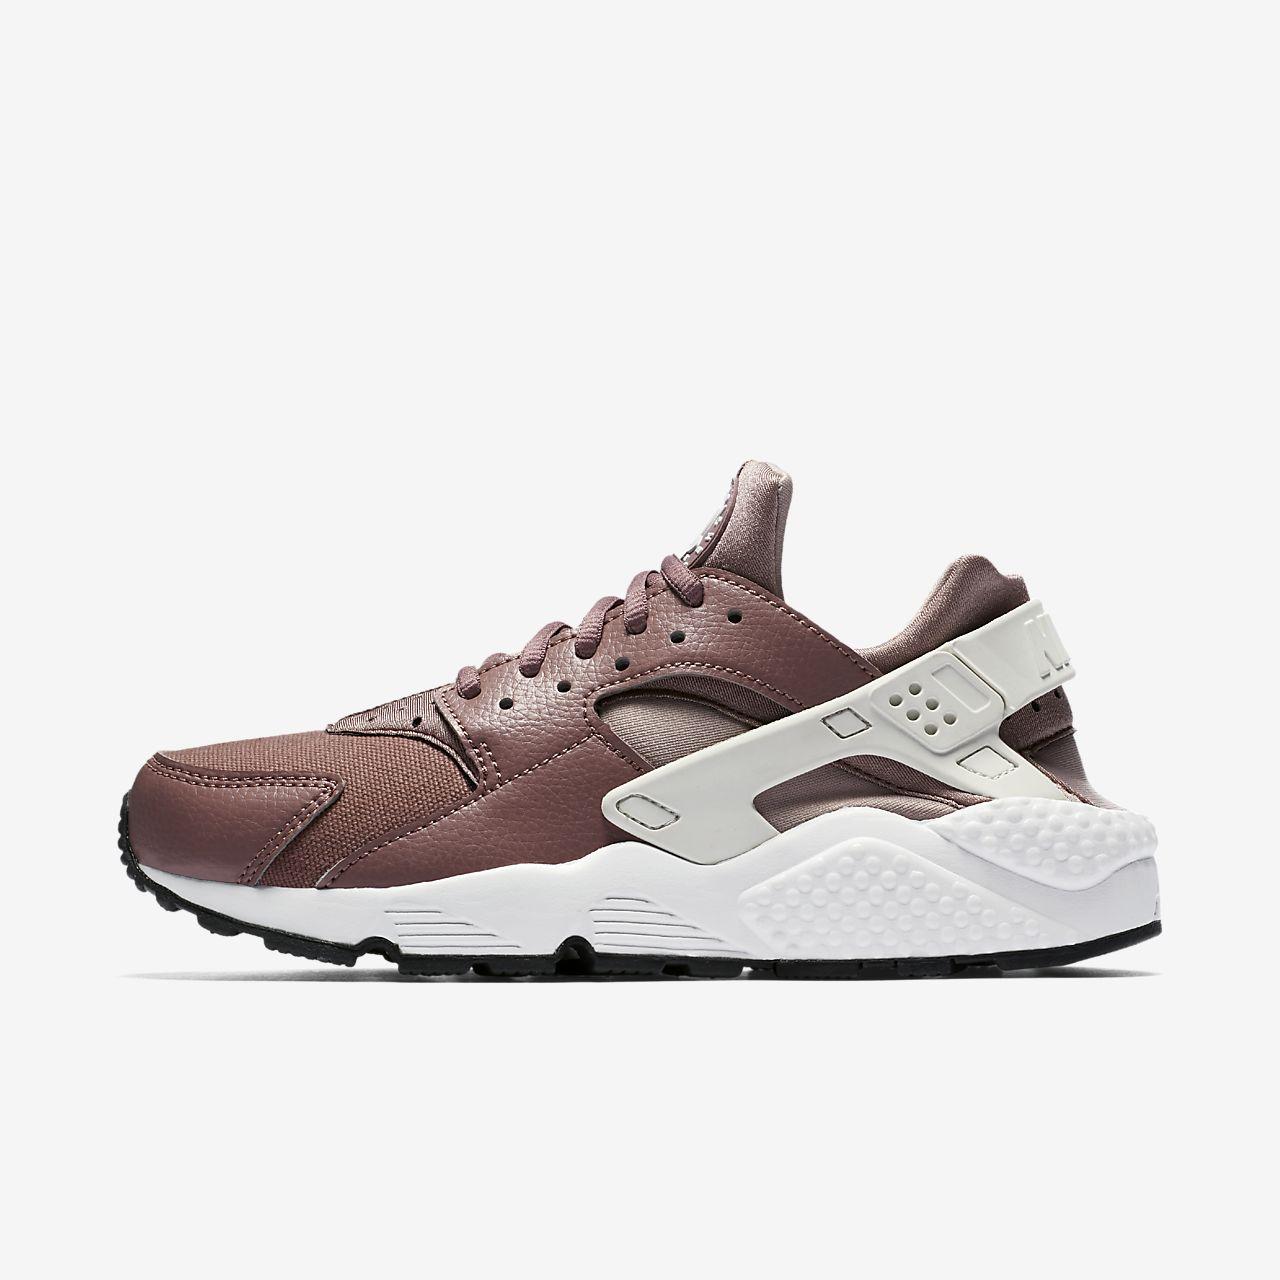 online retailer 5add4 2ed25 ... Buty damskie Nike Air Huarache